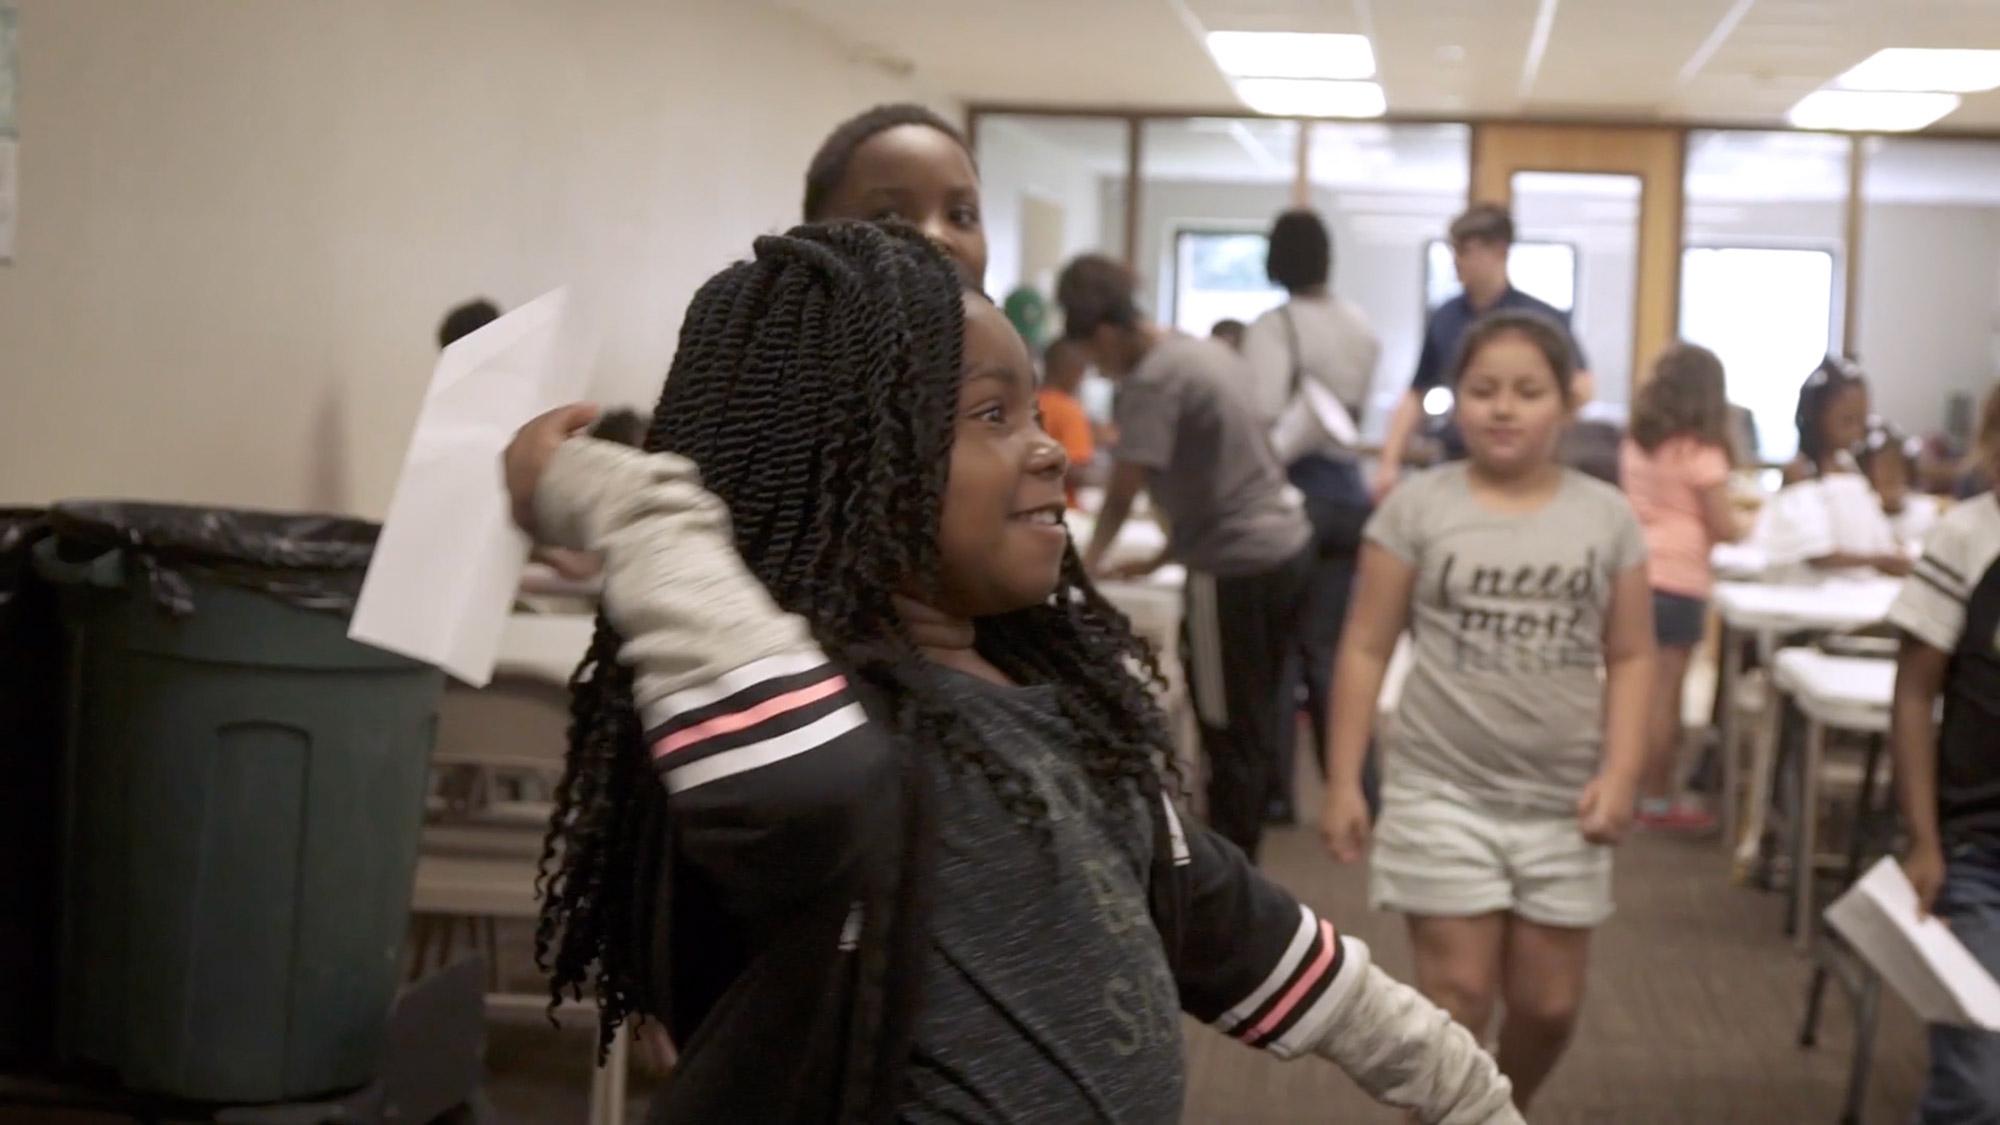 Student throwing paper plane in University of West Florida Graduate's Inertia program